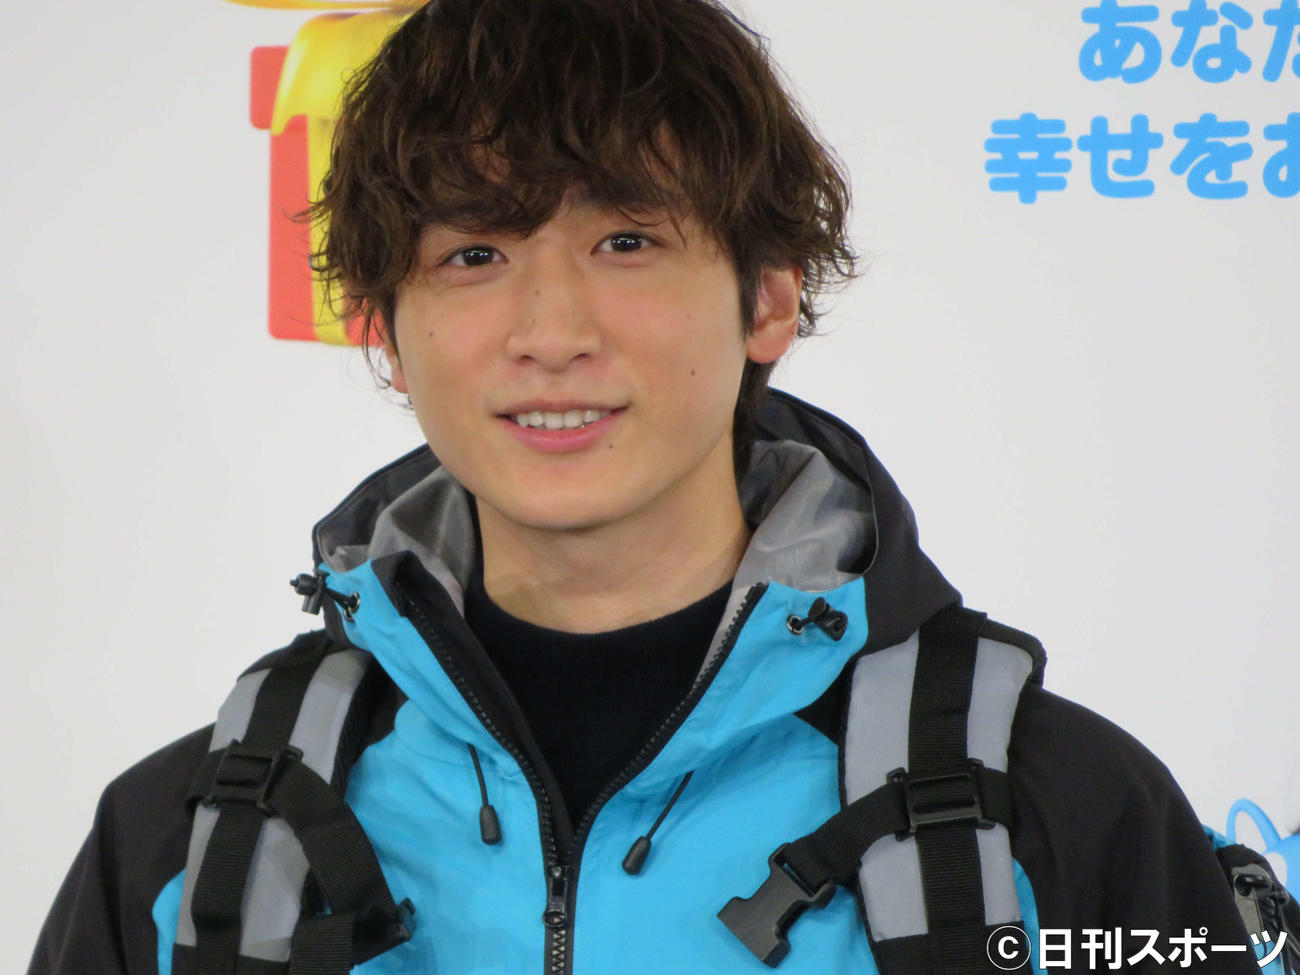 「Wolt BLUE SANTA SPECIAL」開始記念PRイベントに出席した小関裕太(撮影・三須佳夏)